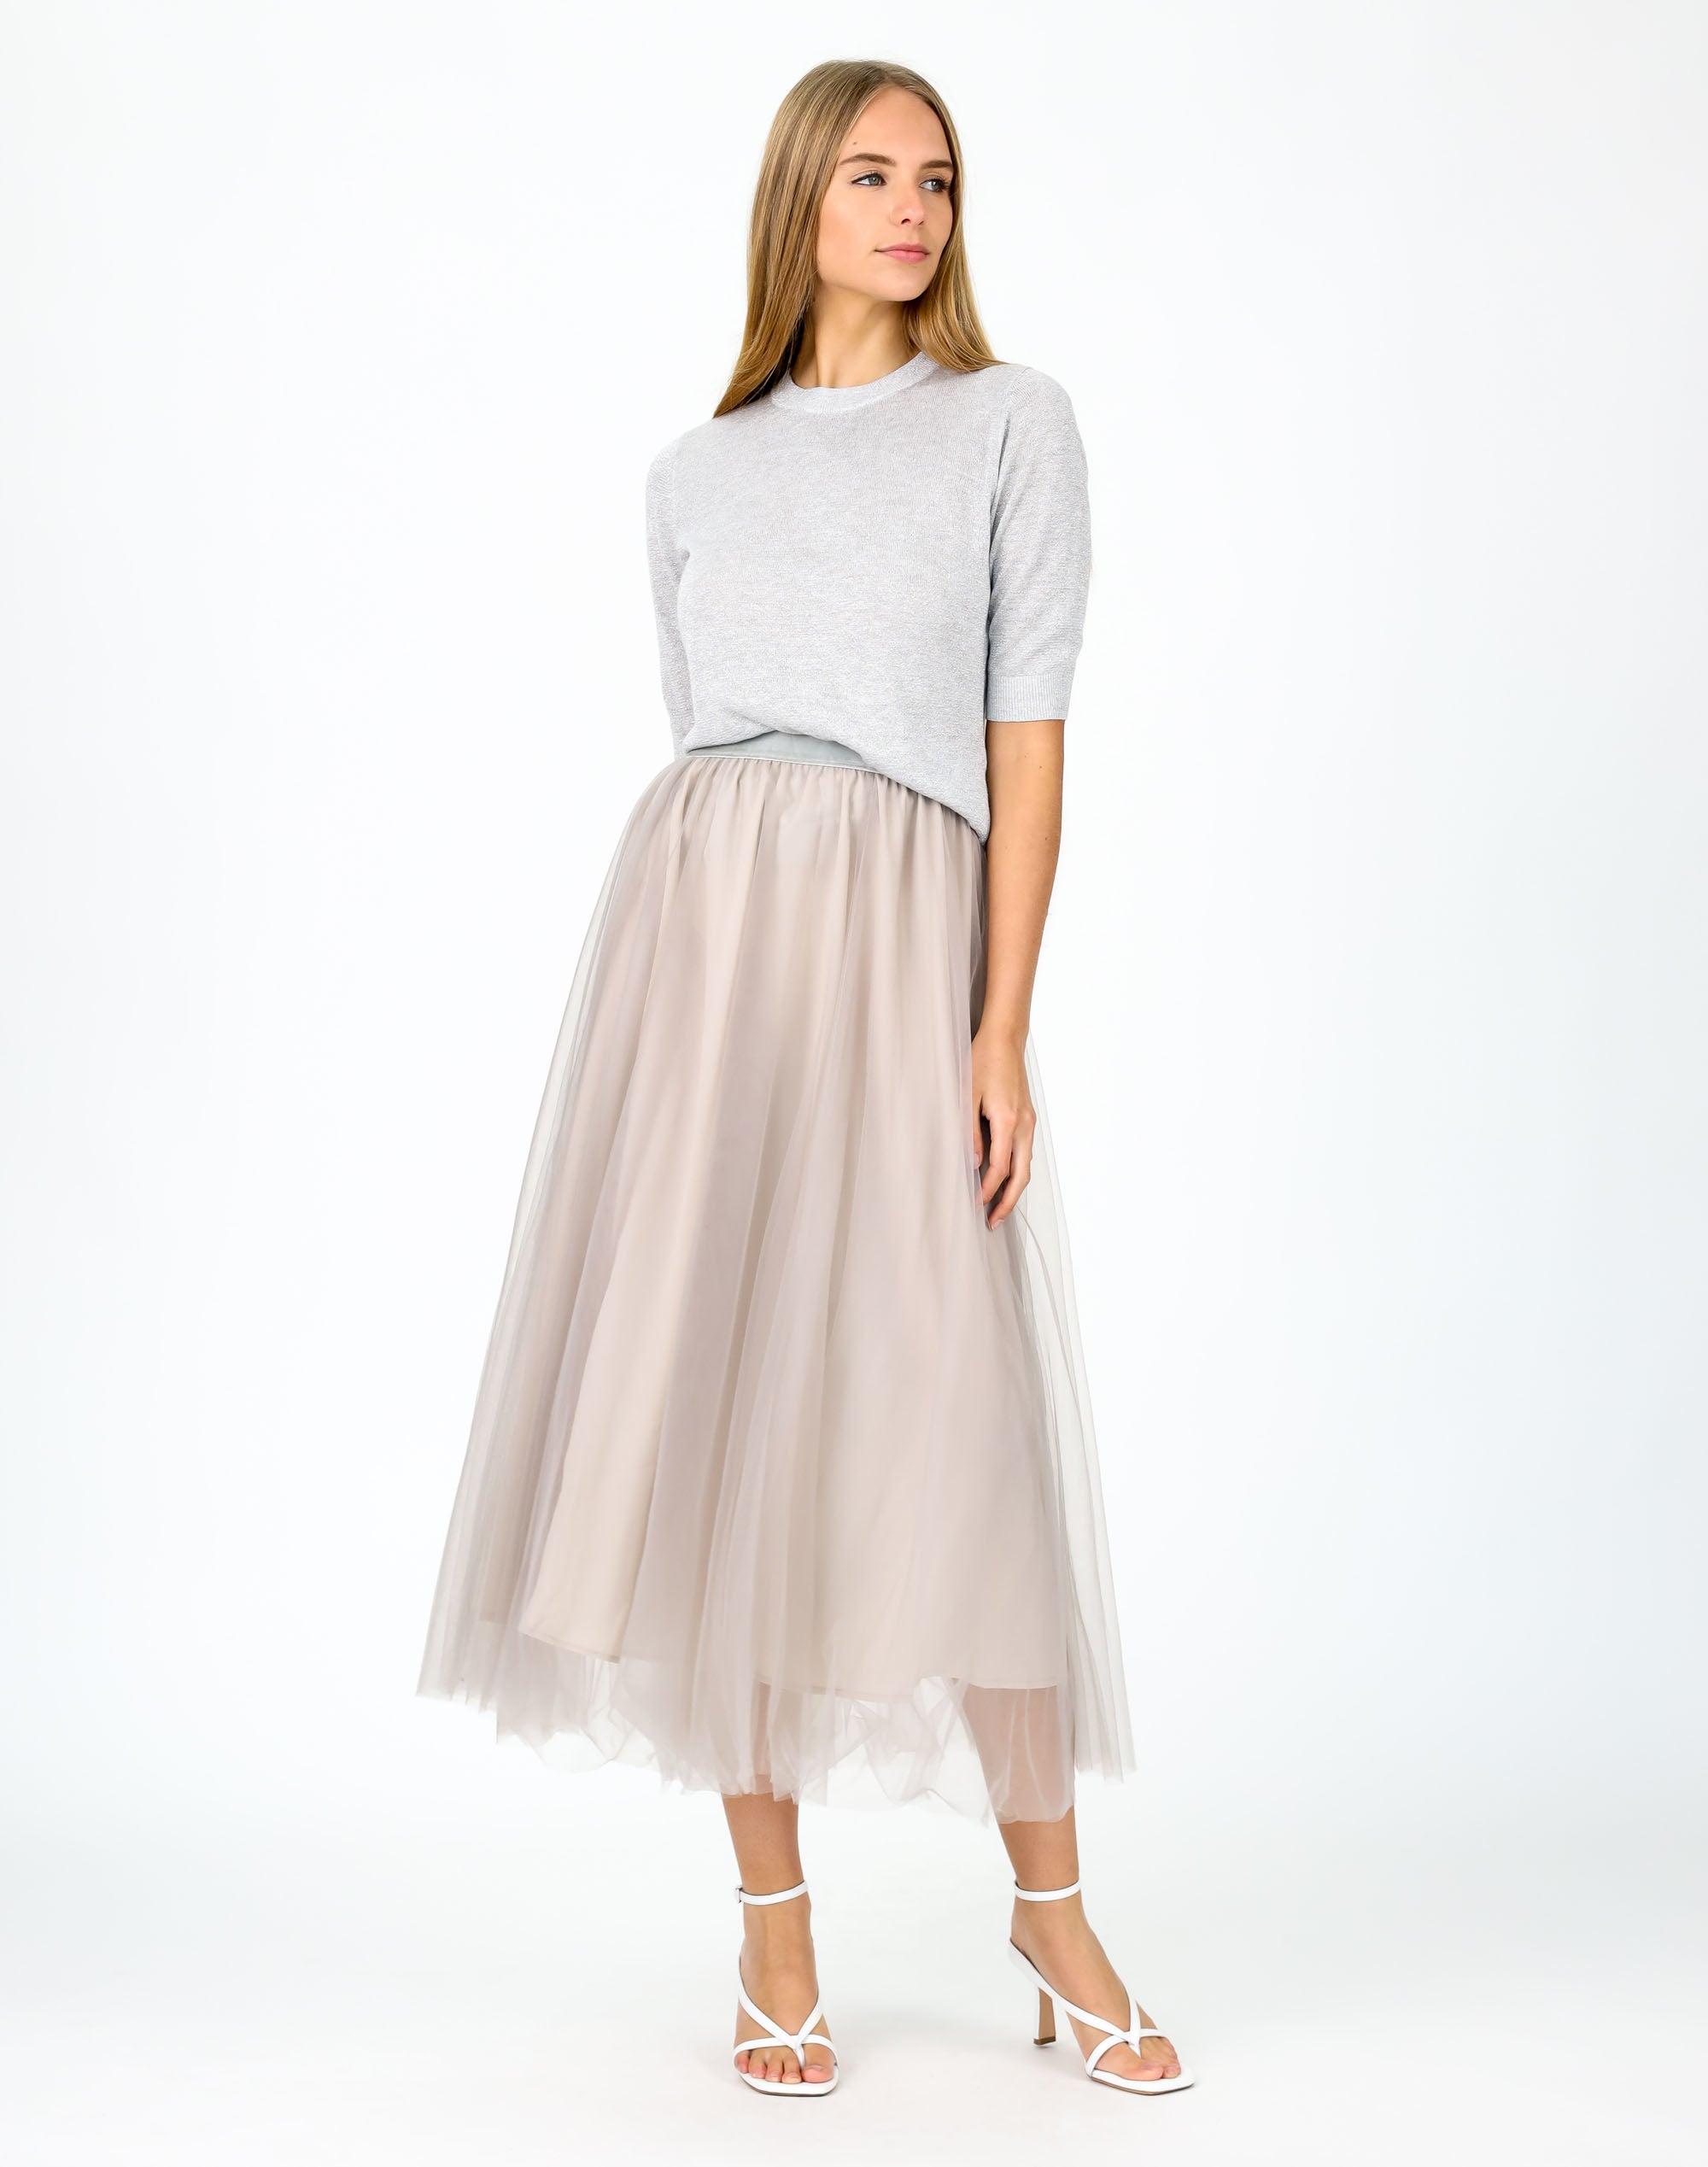 Short Sleeve Lurex Sweater